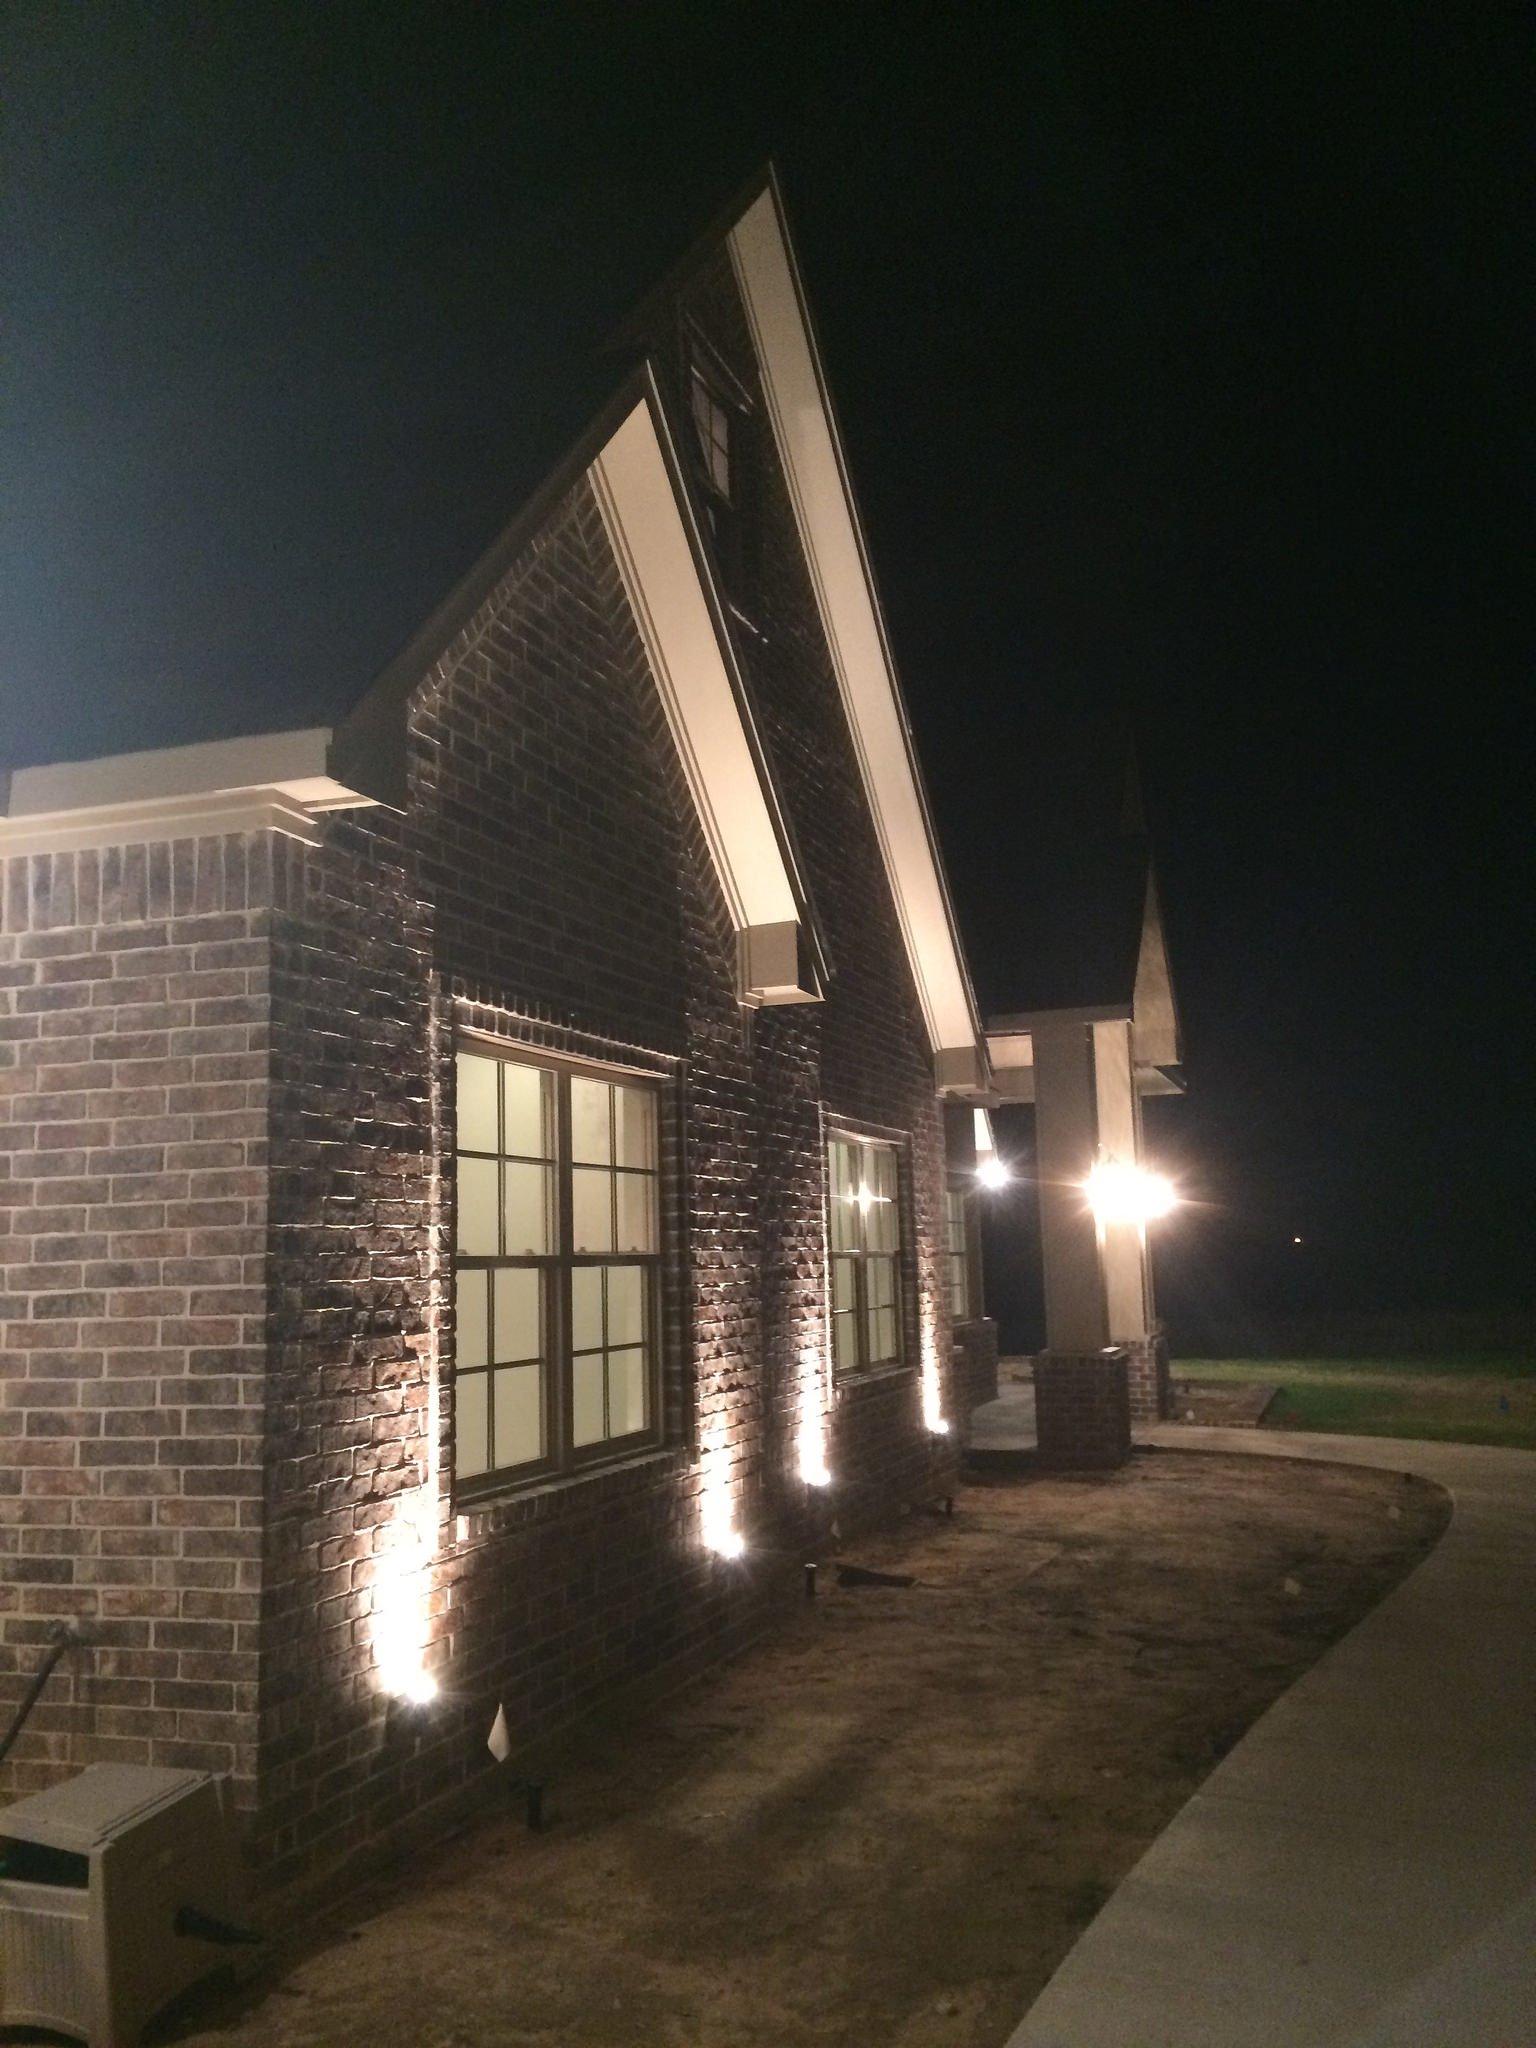 Jk Hatcher Homes - Clemons Project